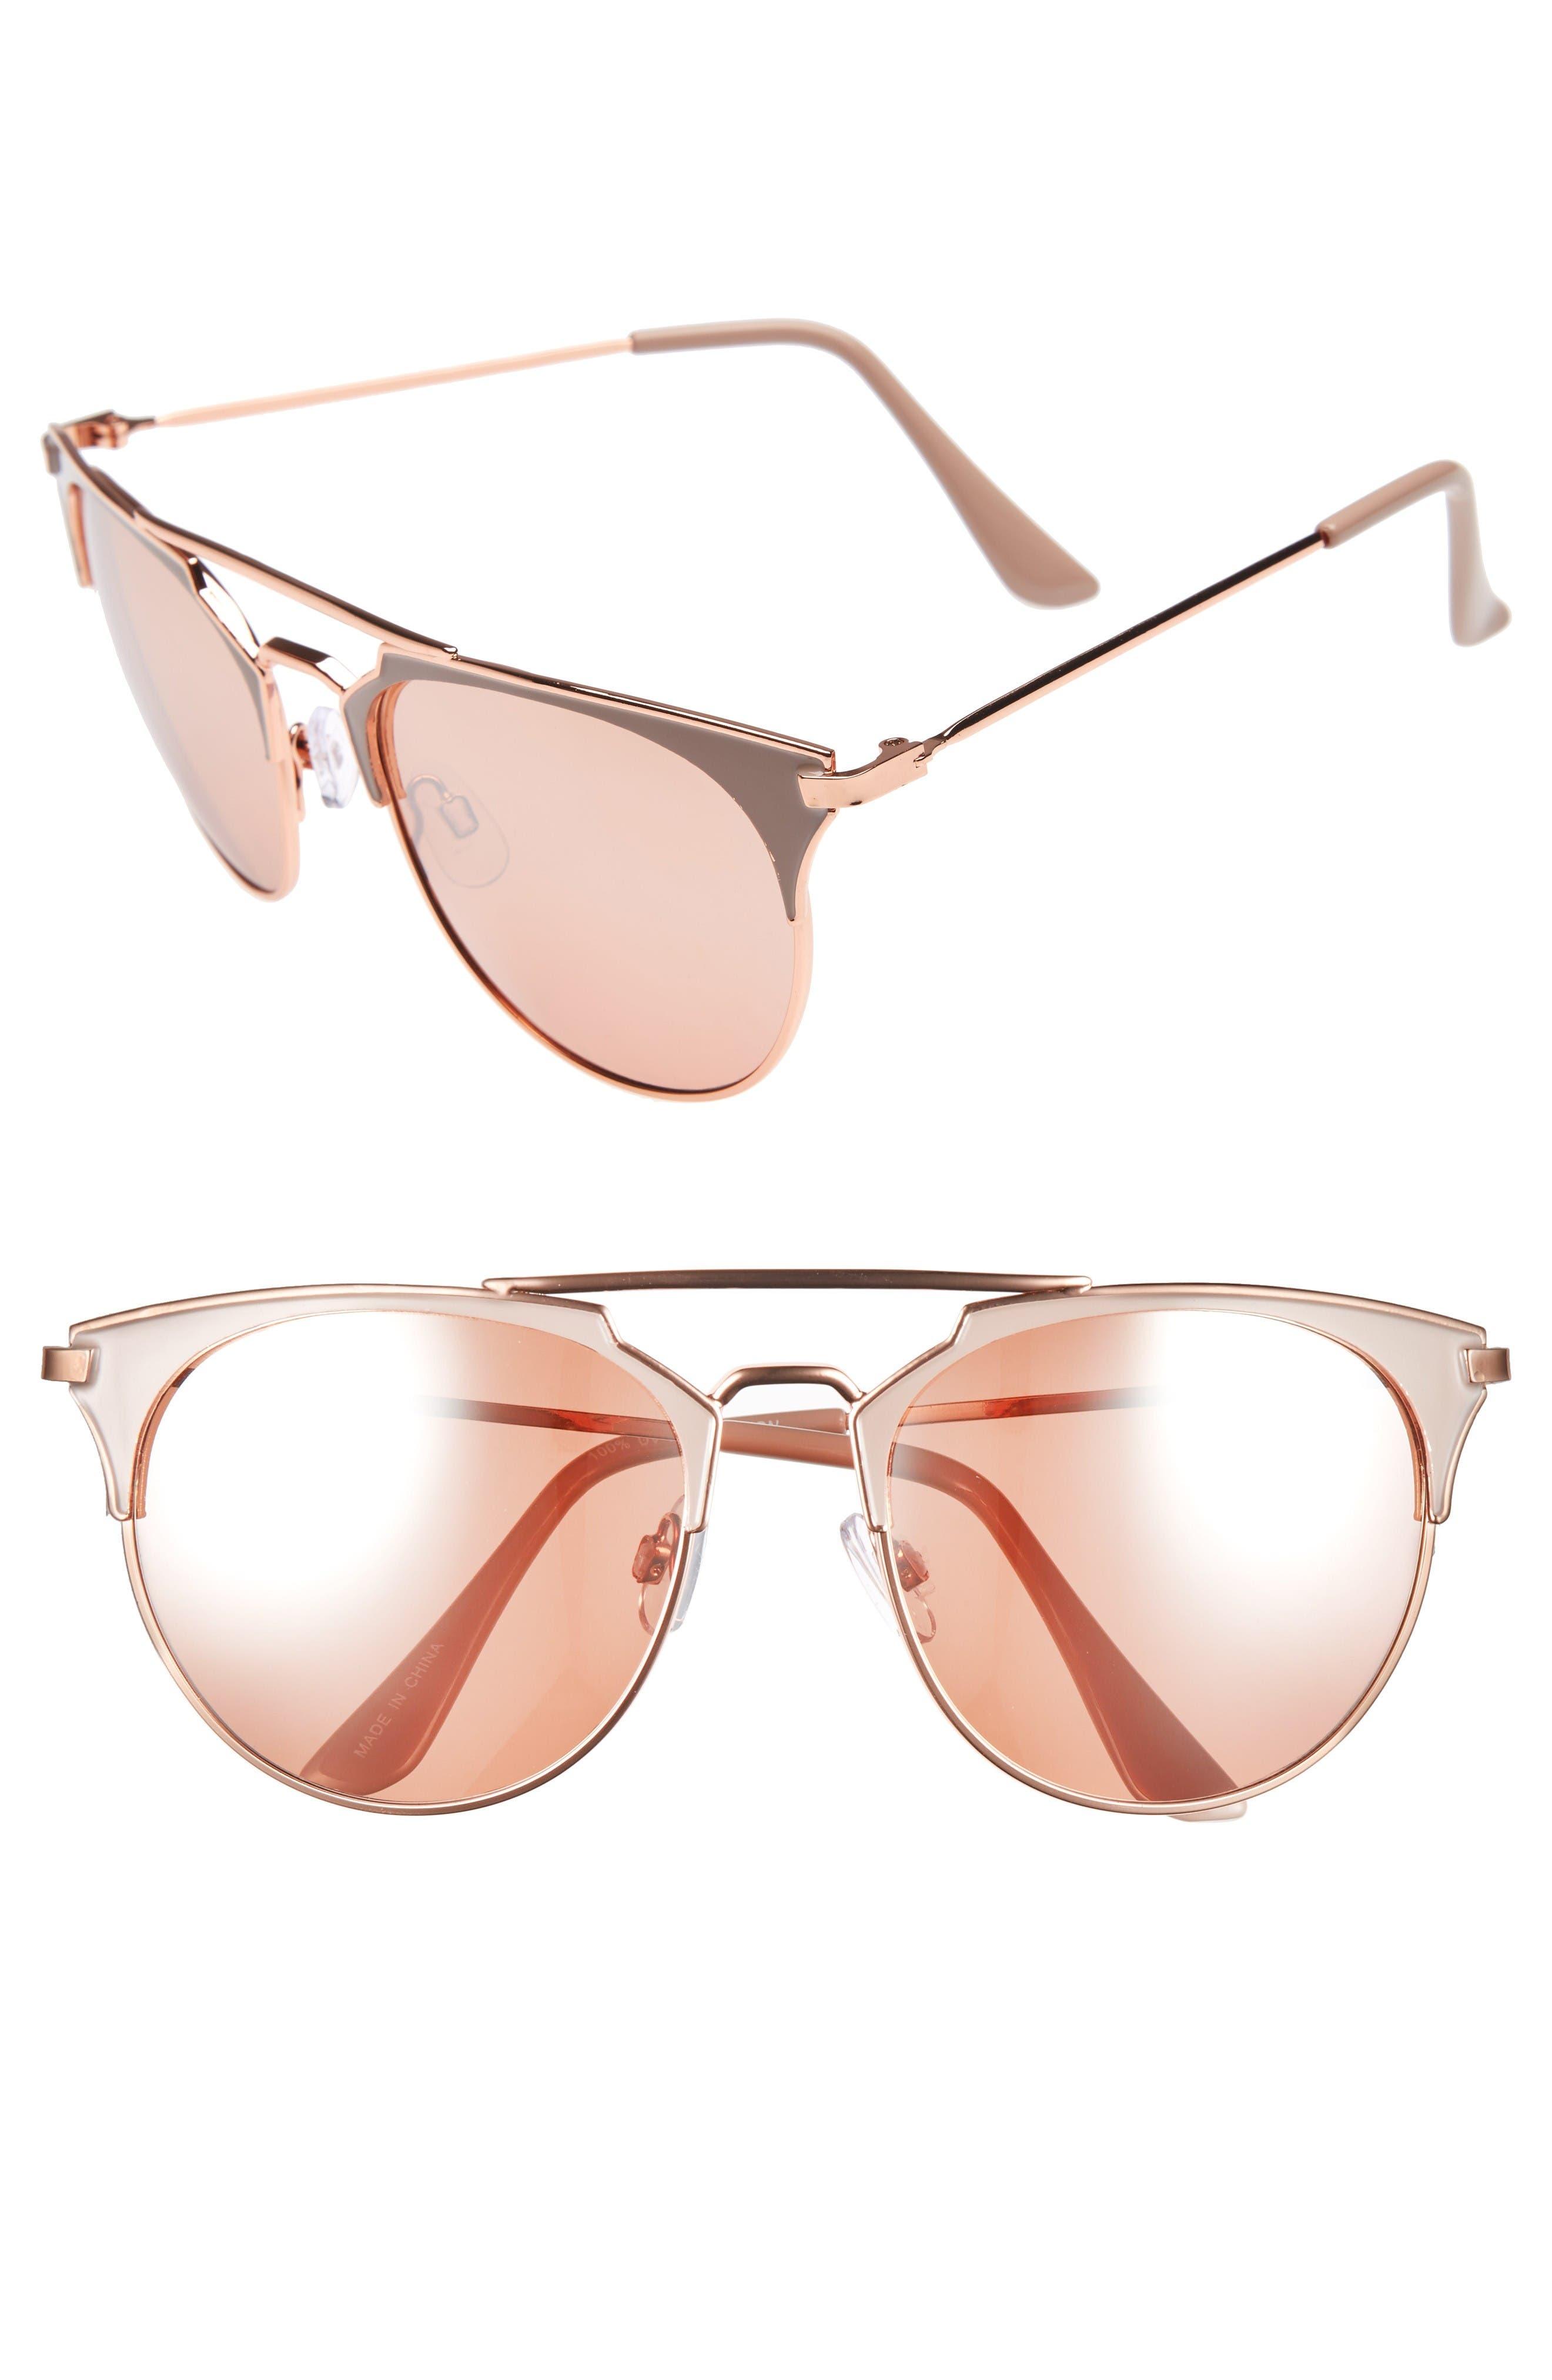 Main Image - BP. Retro Sunglasses